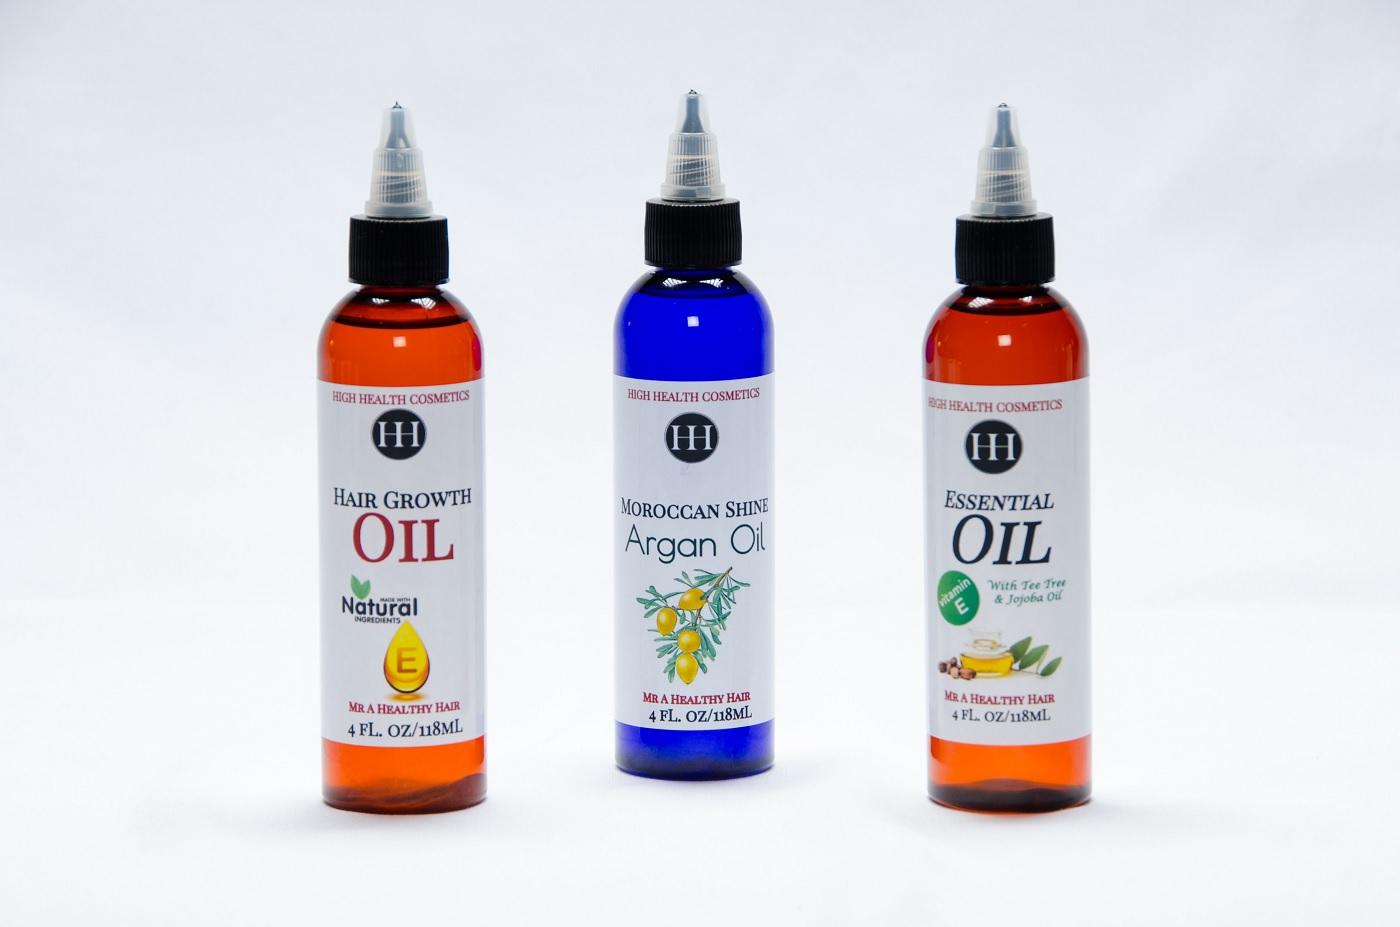 all 3 oils